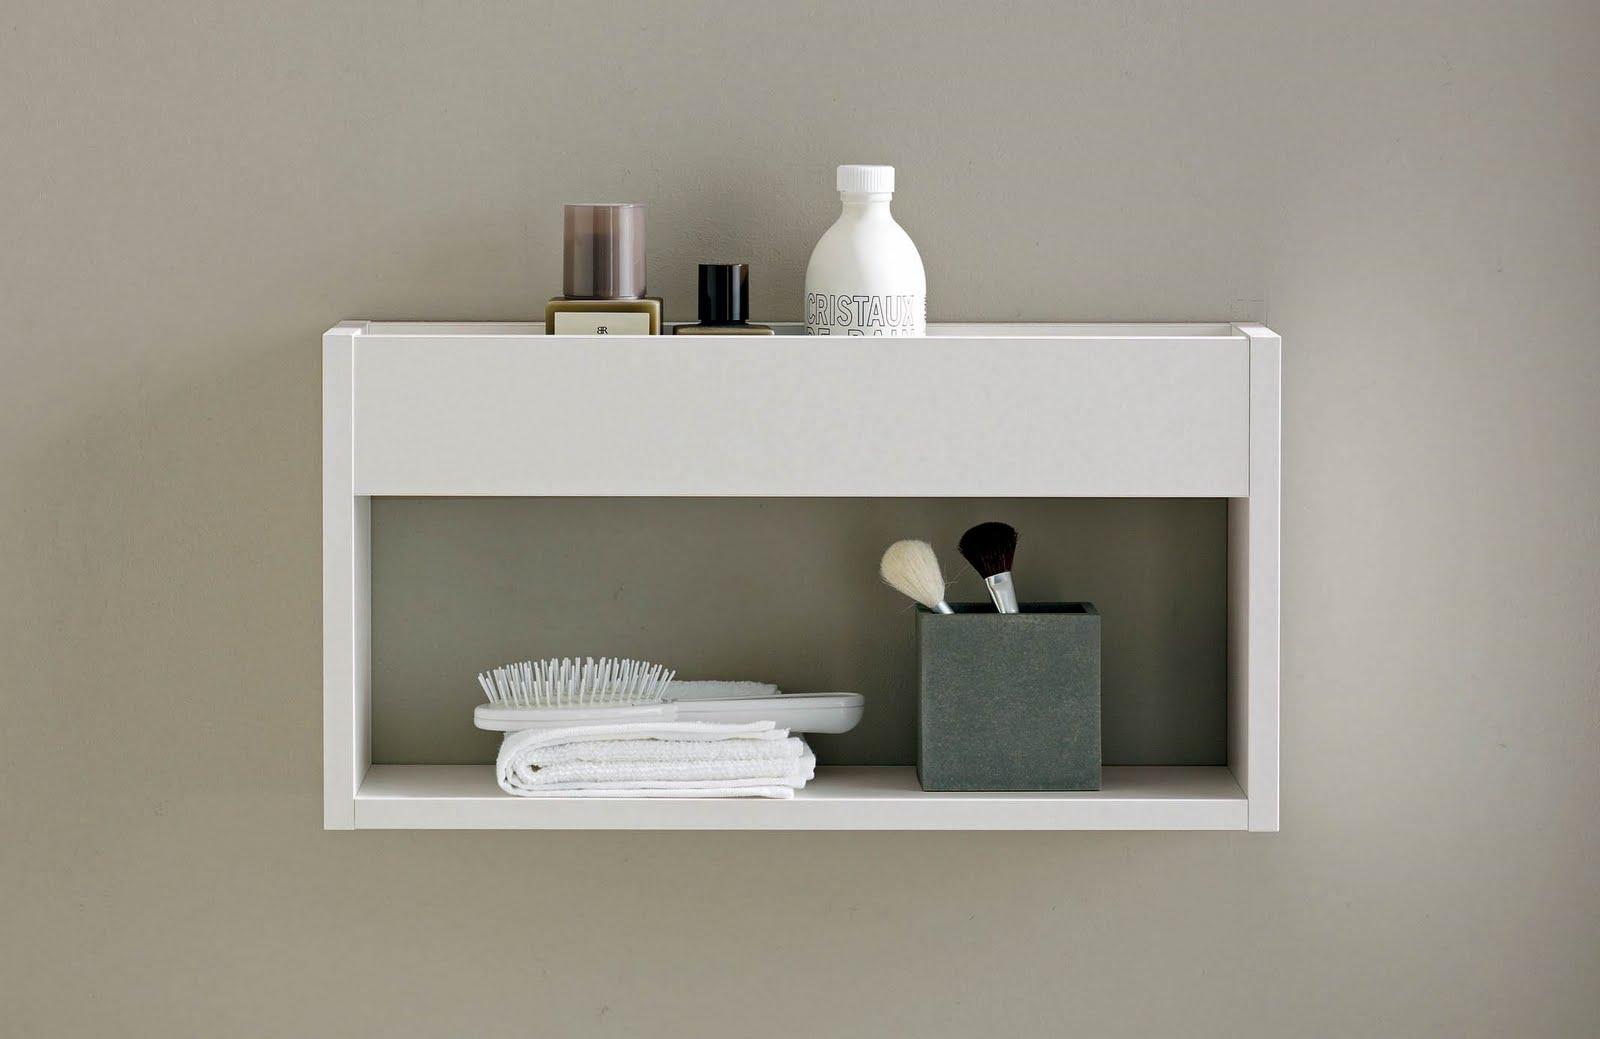 Muebles De Baño Duravit:White Bathroom Wall Shelf